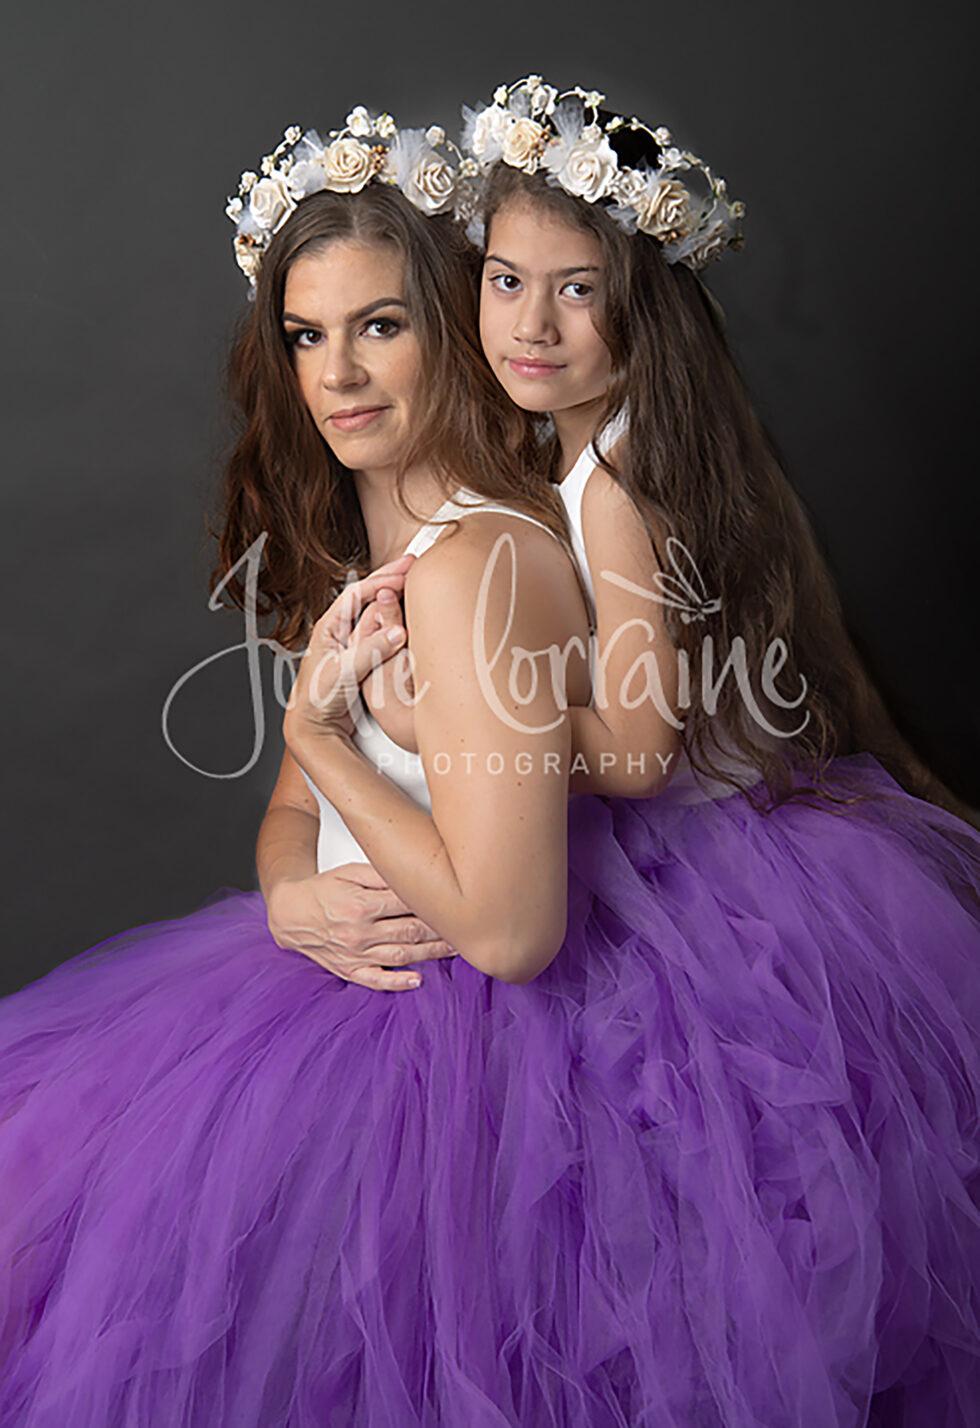 Jodie Lorraine Photography Brisbane Family Photographer30